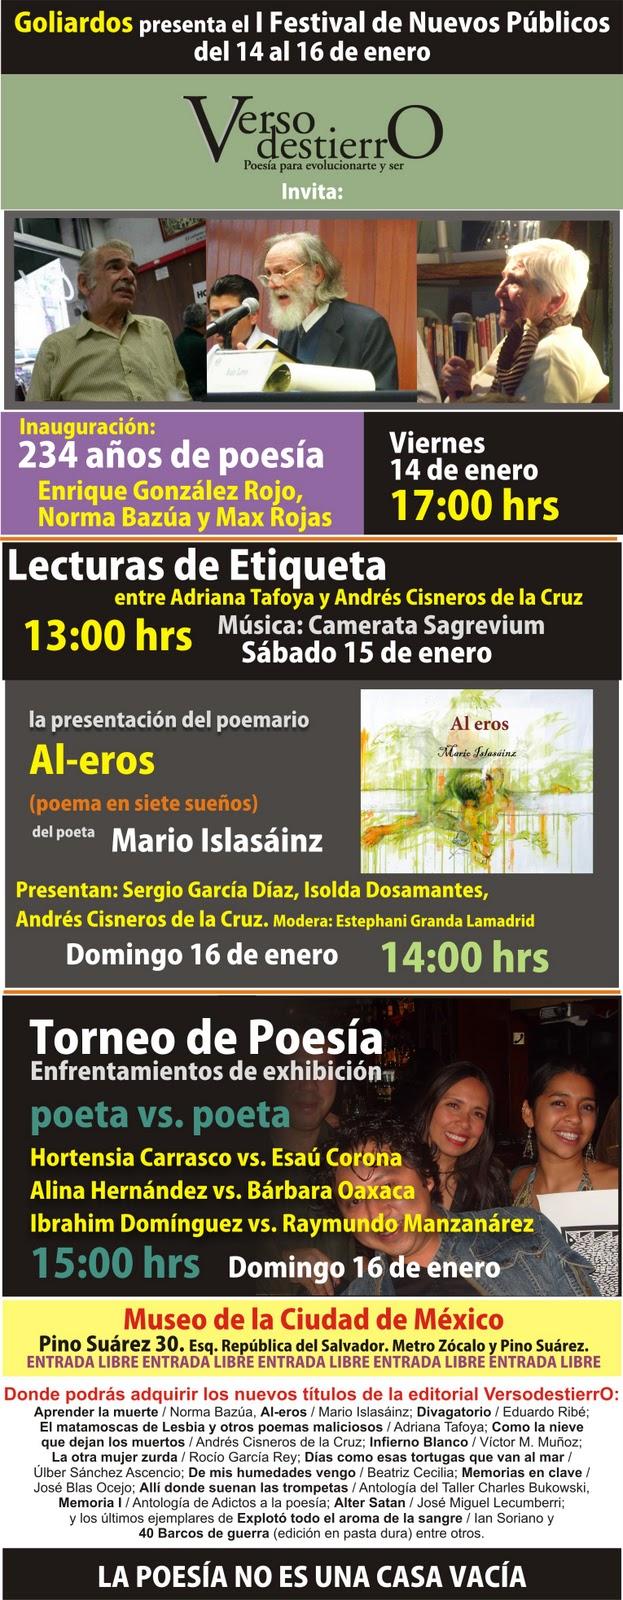 http://4.bp.blogspot.com/_VxjU48ld-po/TSw5c0wEg1I/AAAAAAAABec/Qy5m4PADFgg/s1600/invitacion+museo+de+la+ciudad..jpg